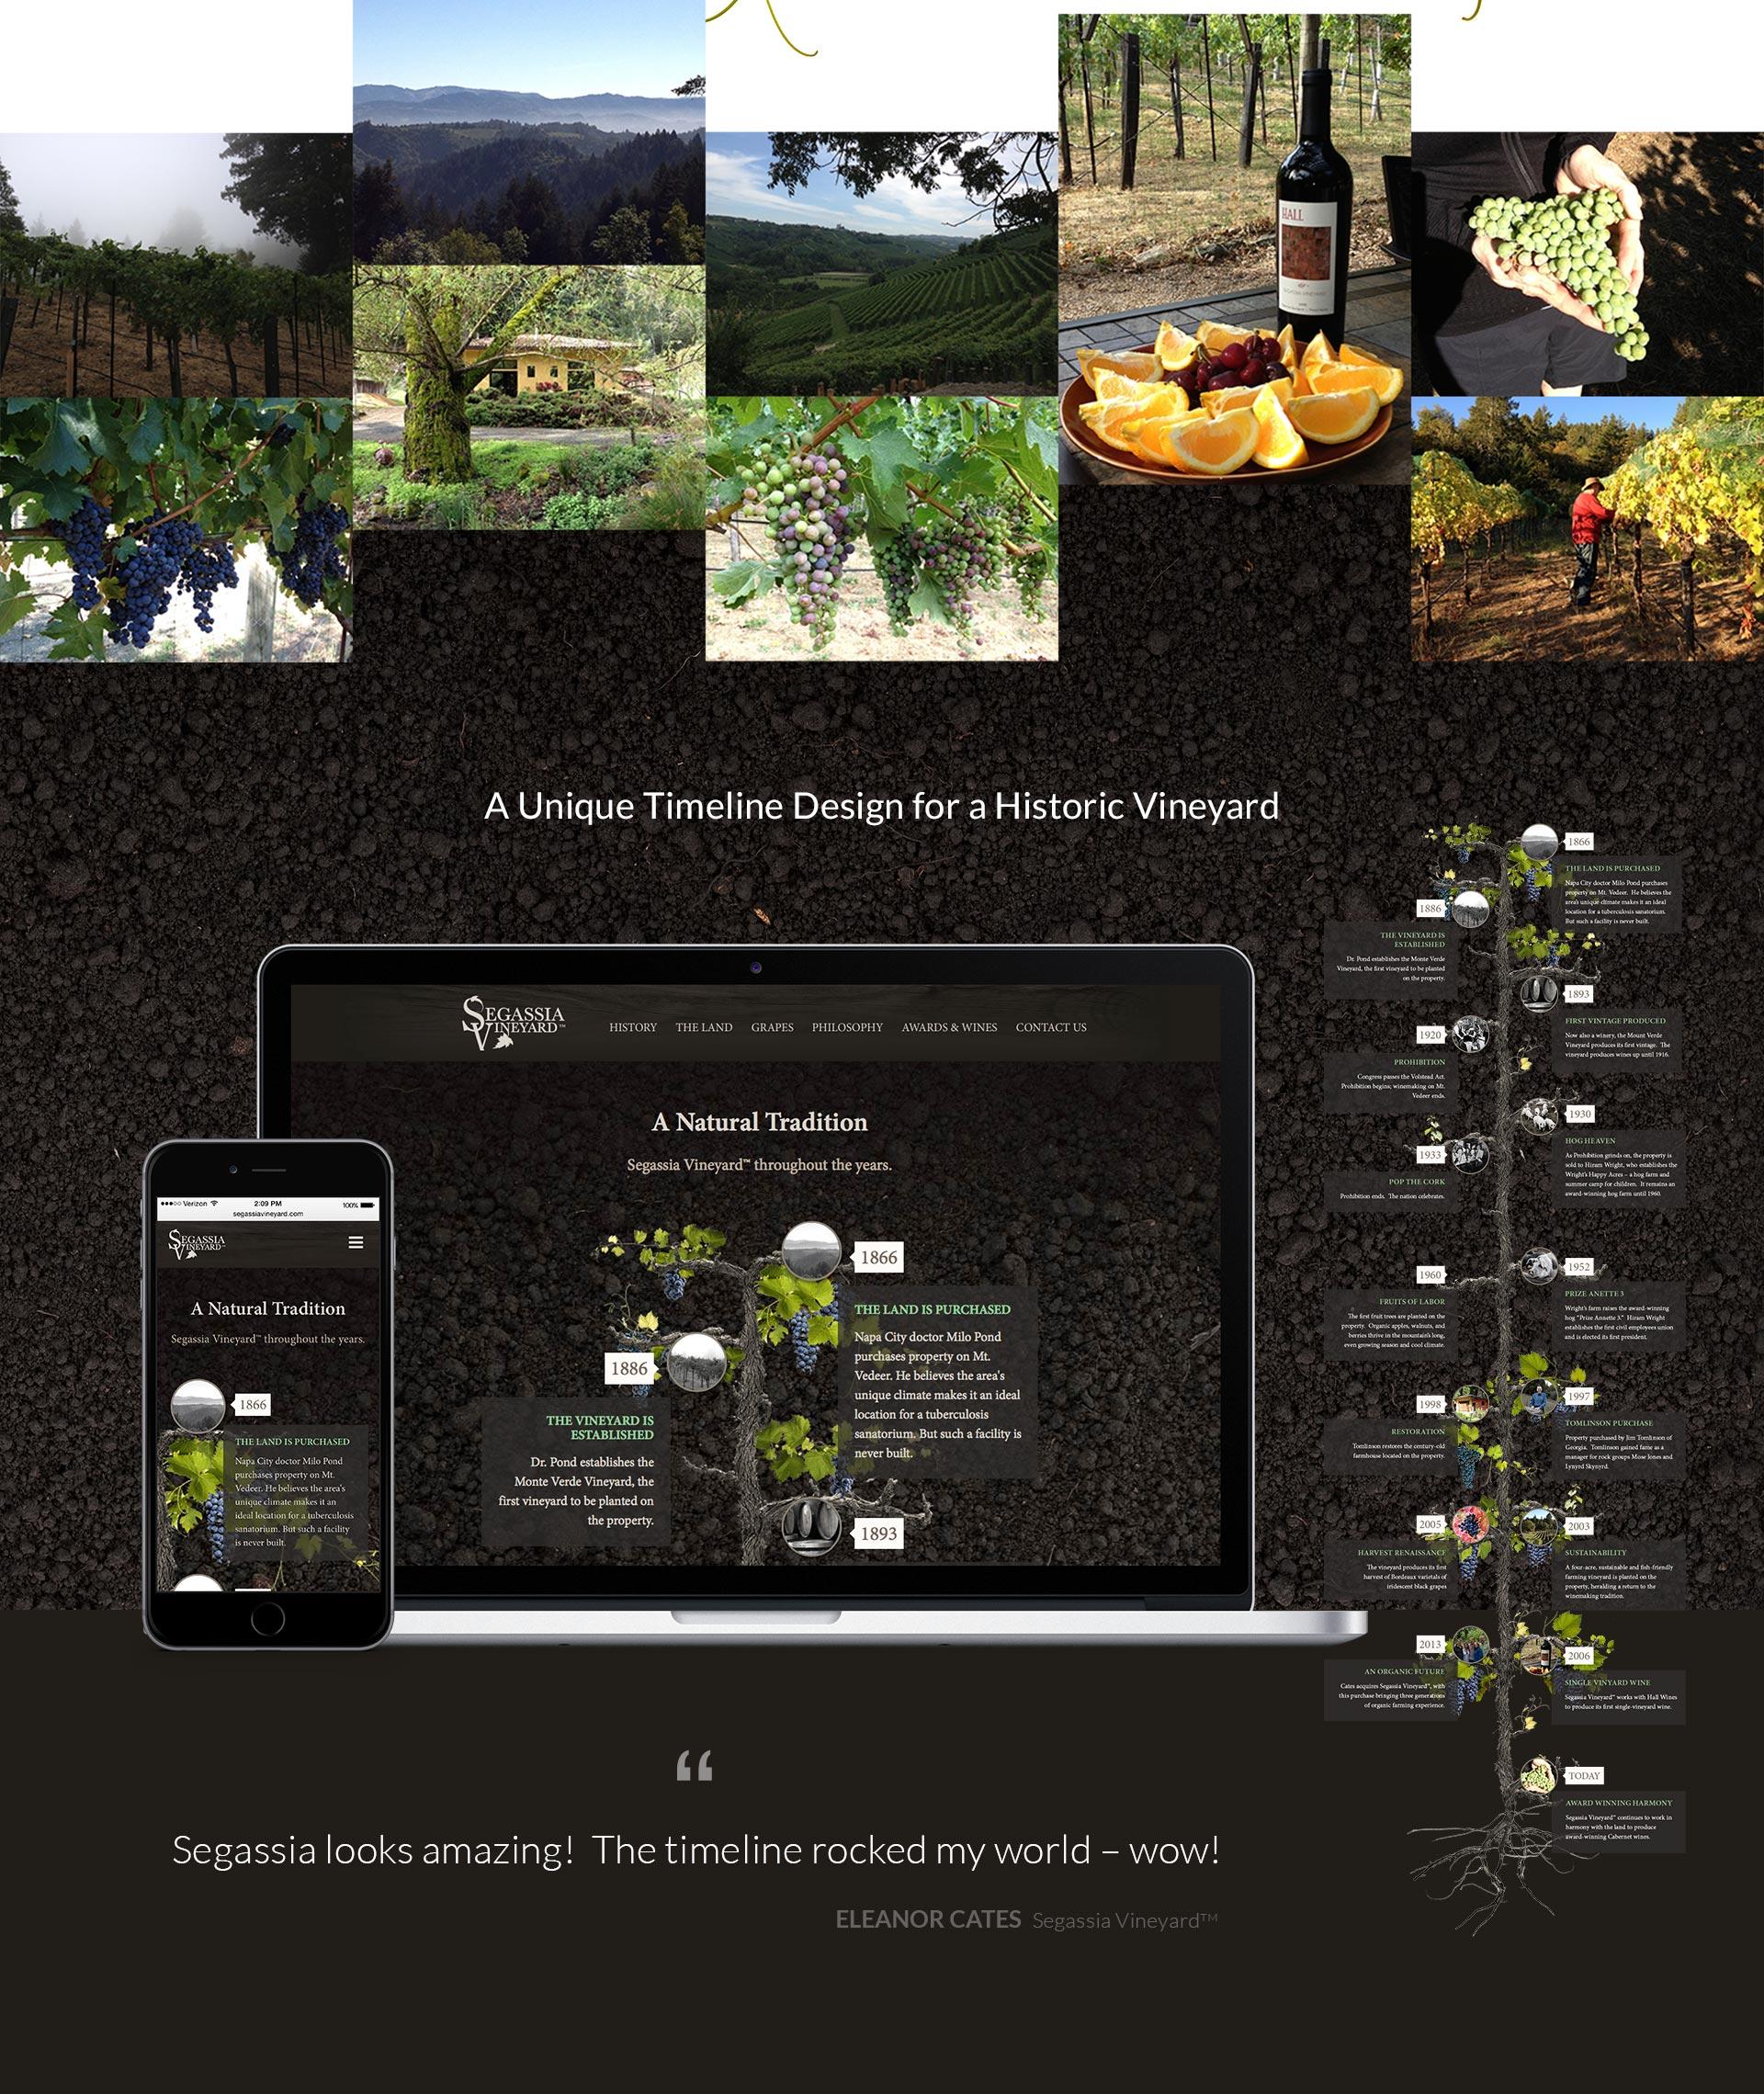 Segassia-Vineyard-Timeline-Design